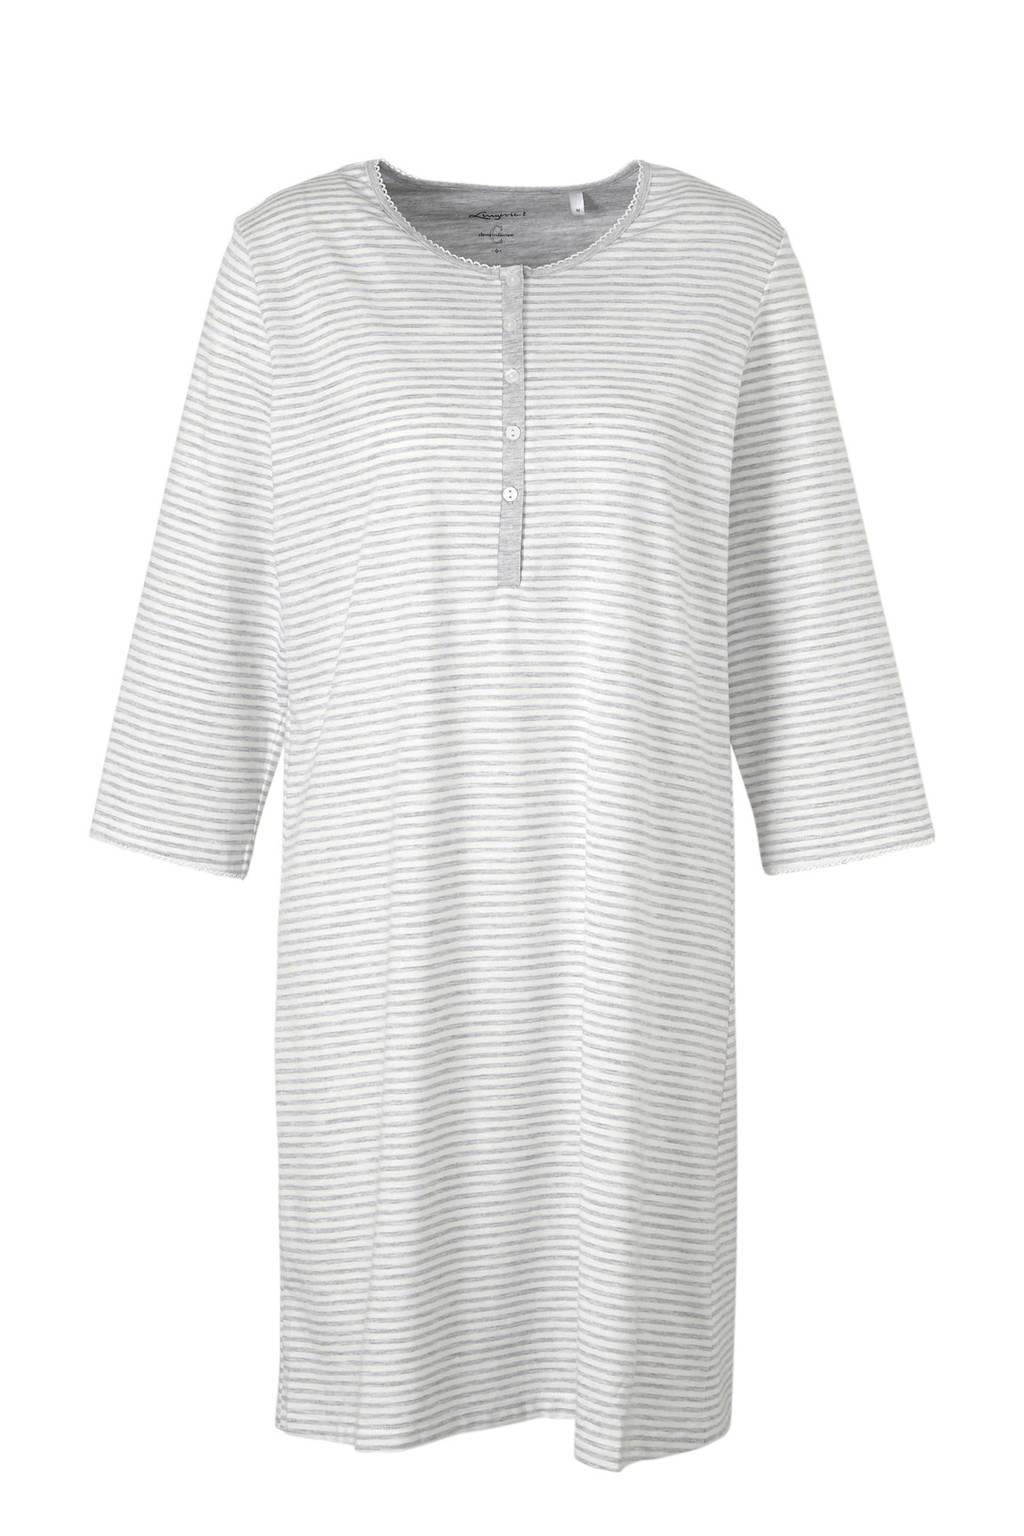 C&A nachthemd met all over streepprint wit/grijs, Wit/grijs